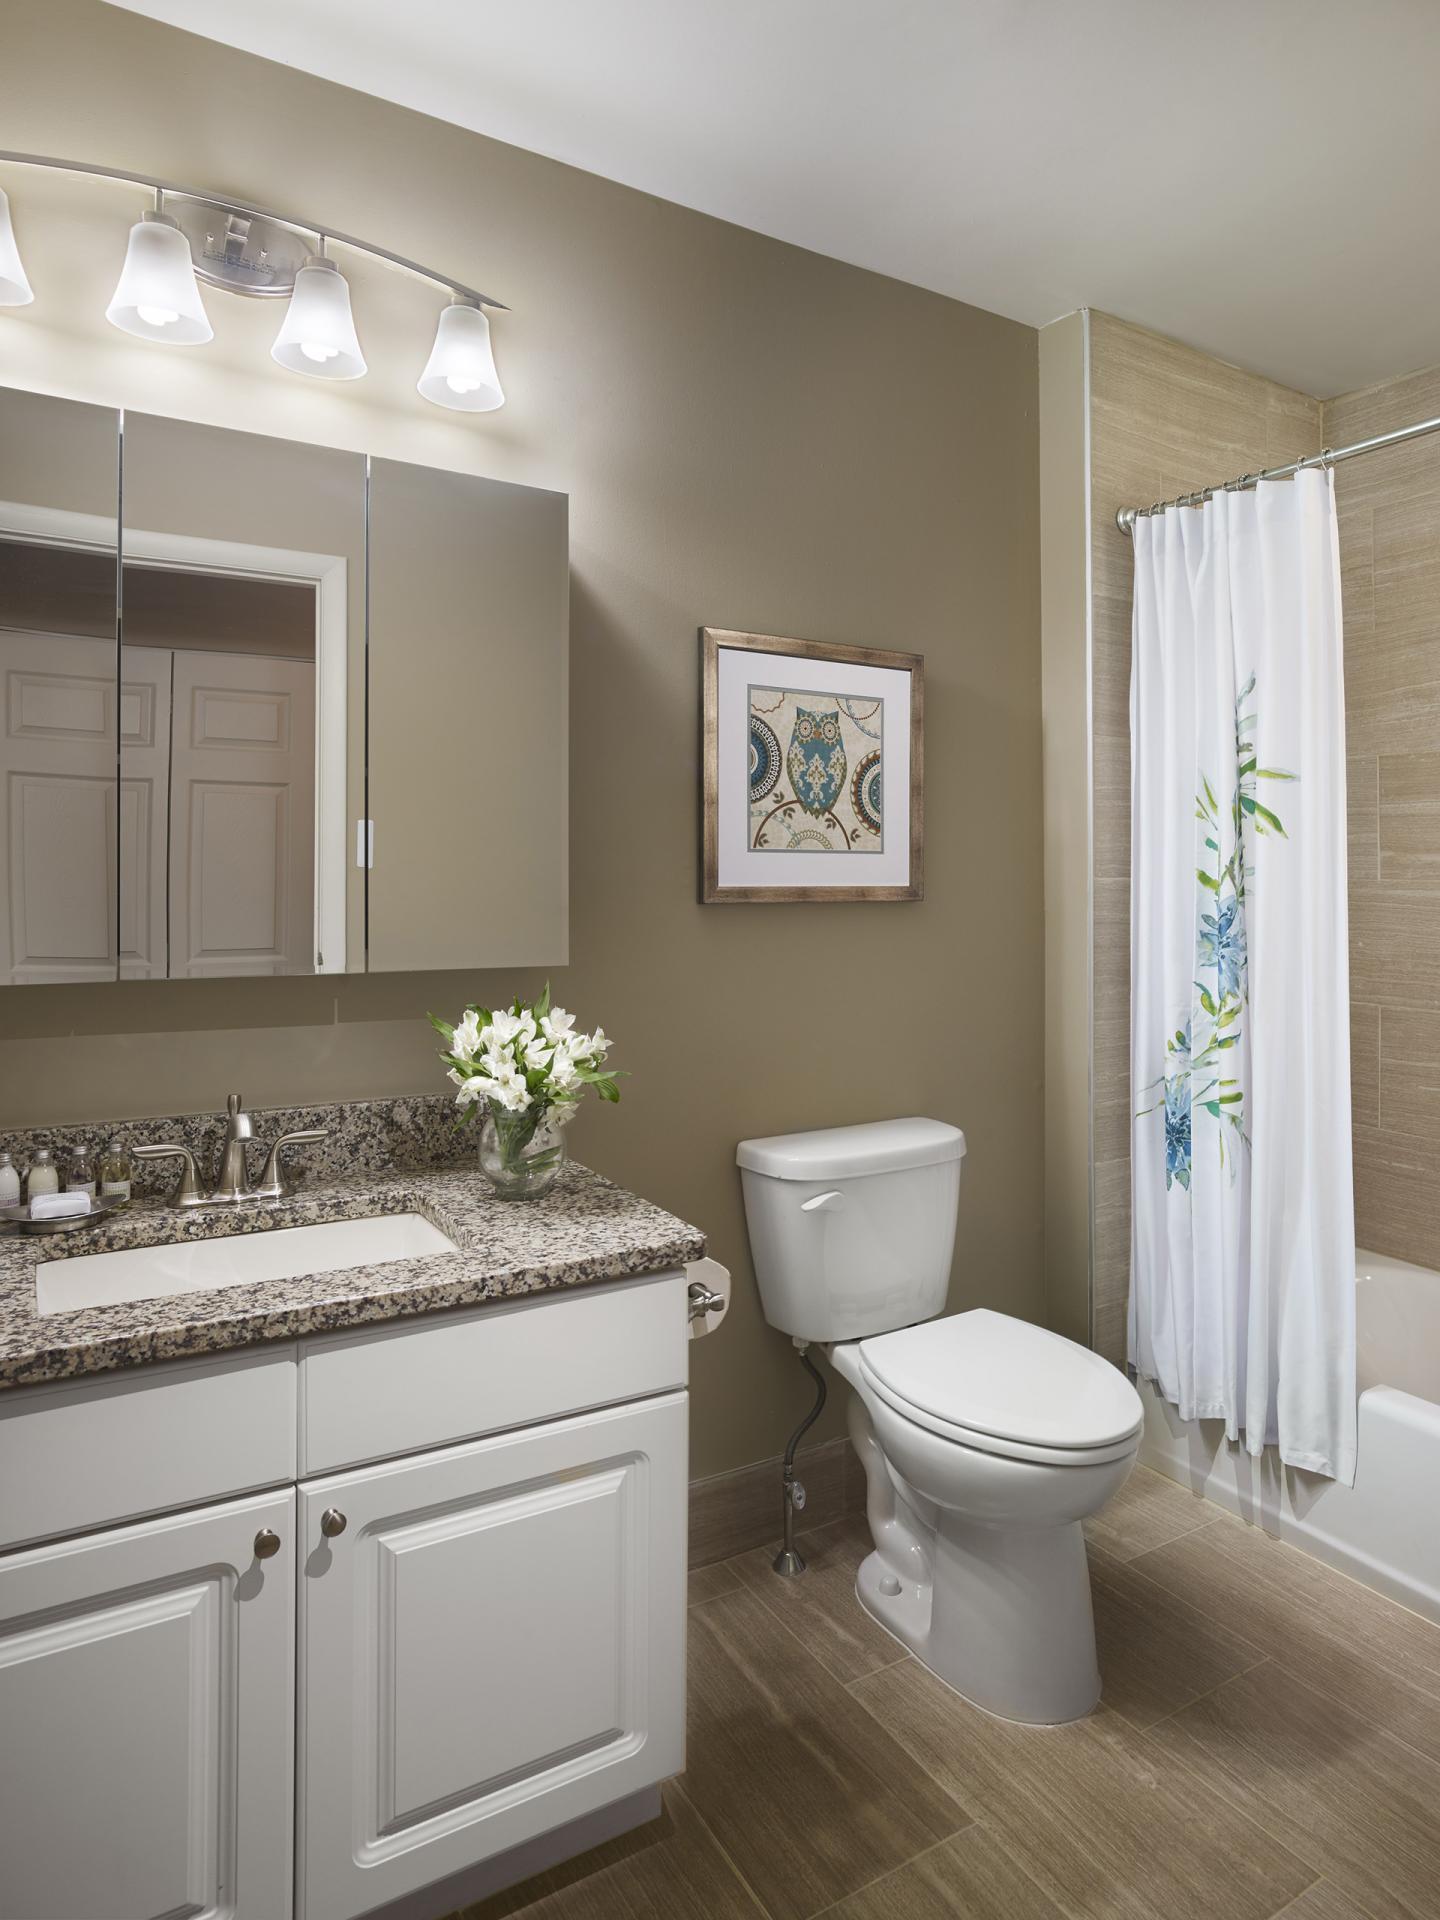 Bathroom at AVE Downingtown Apartments